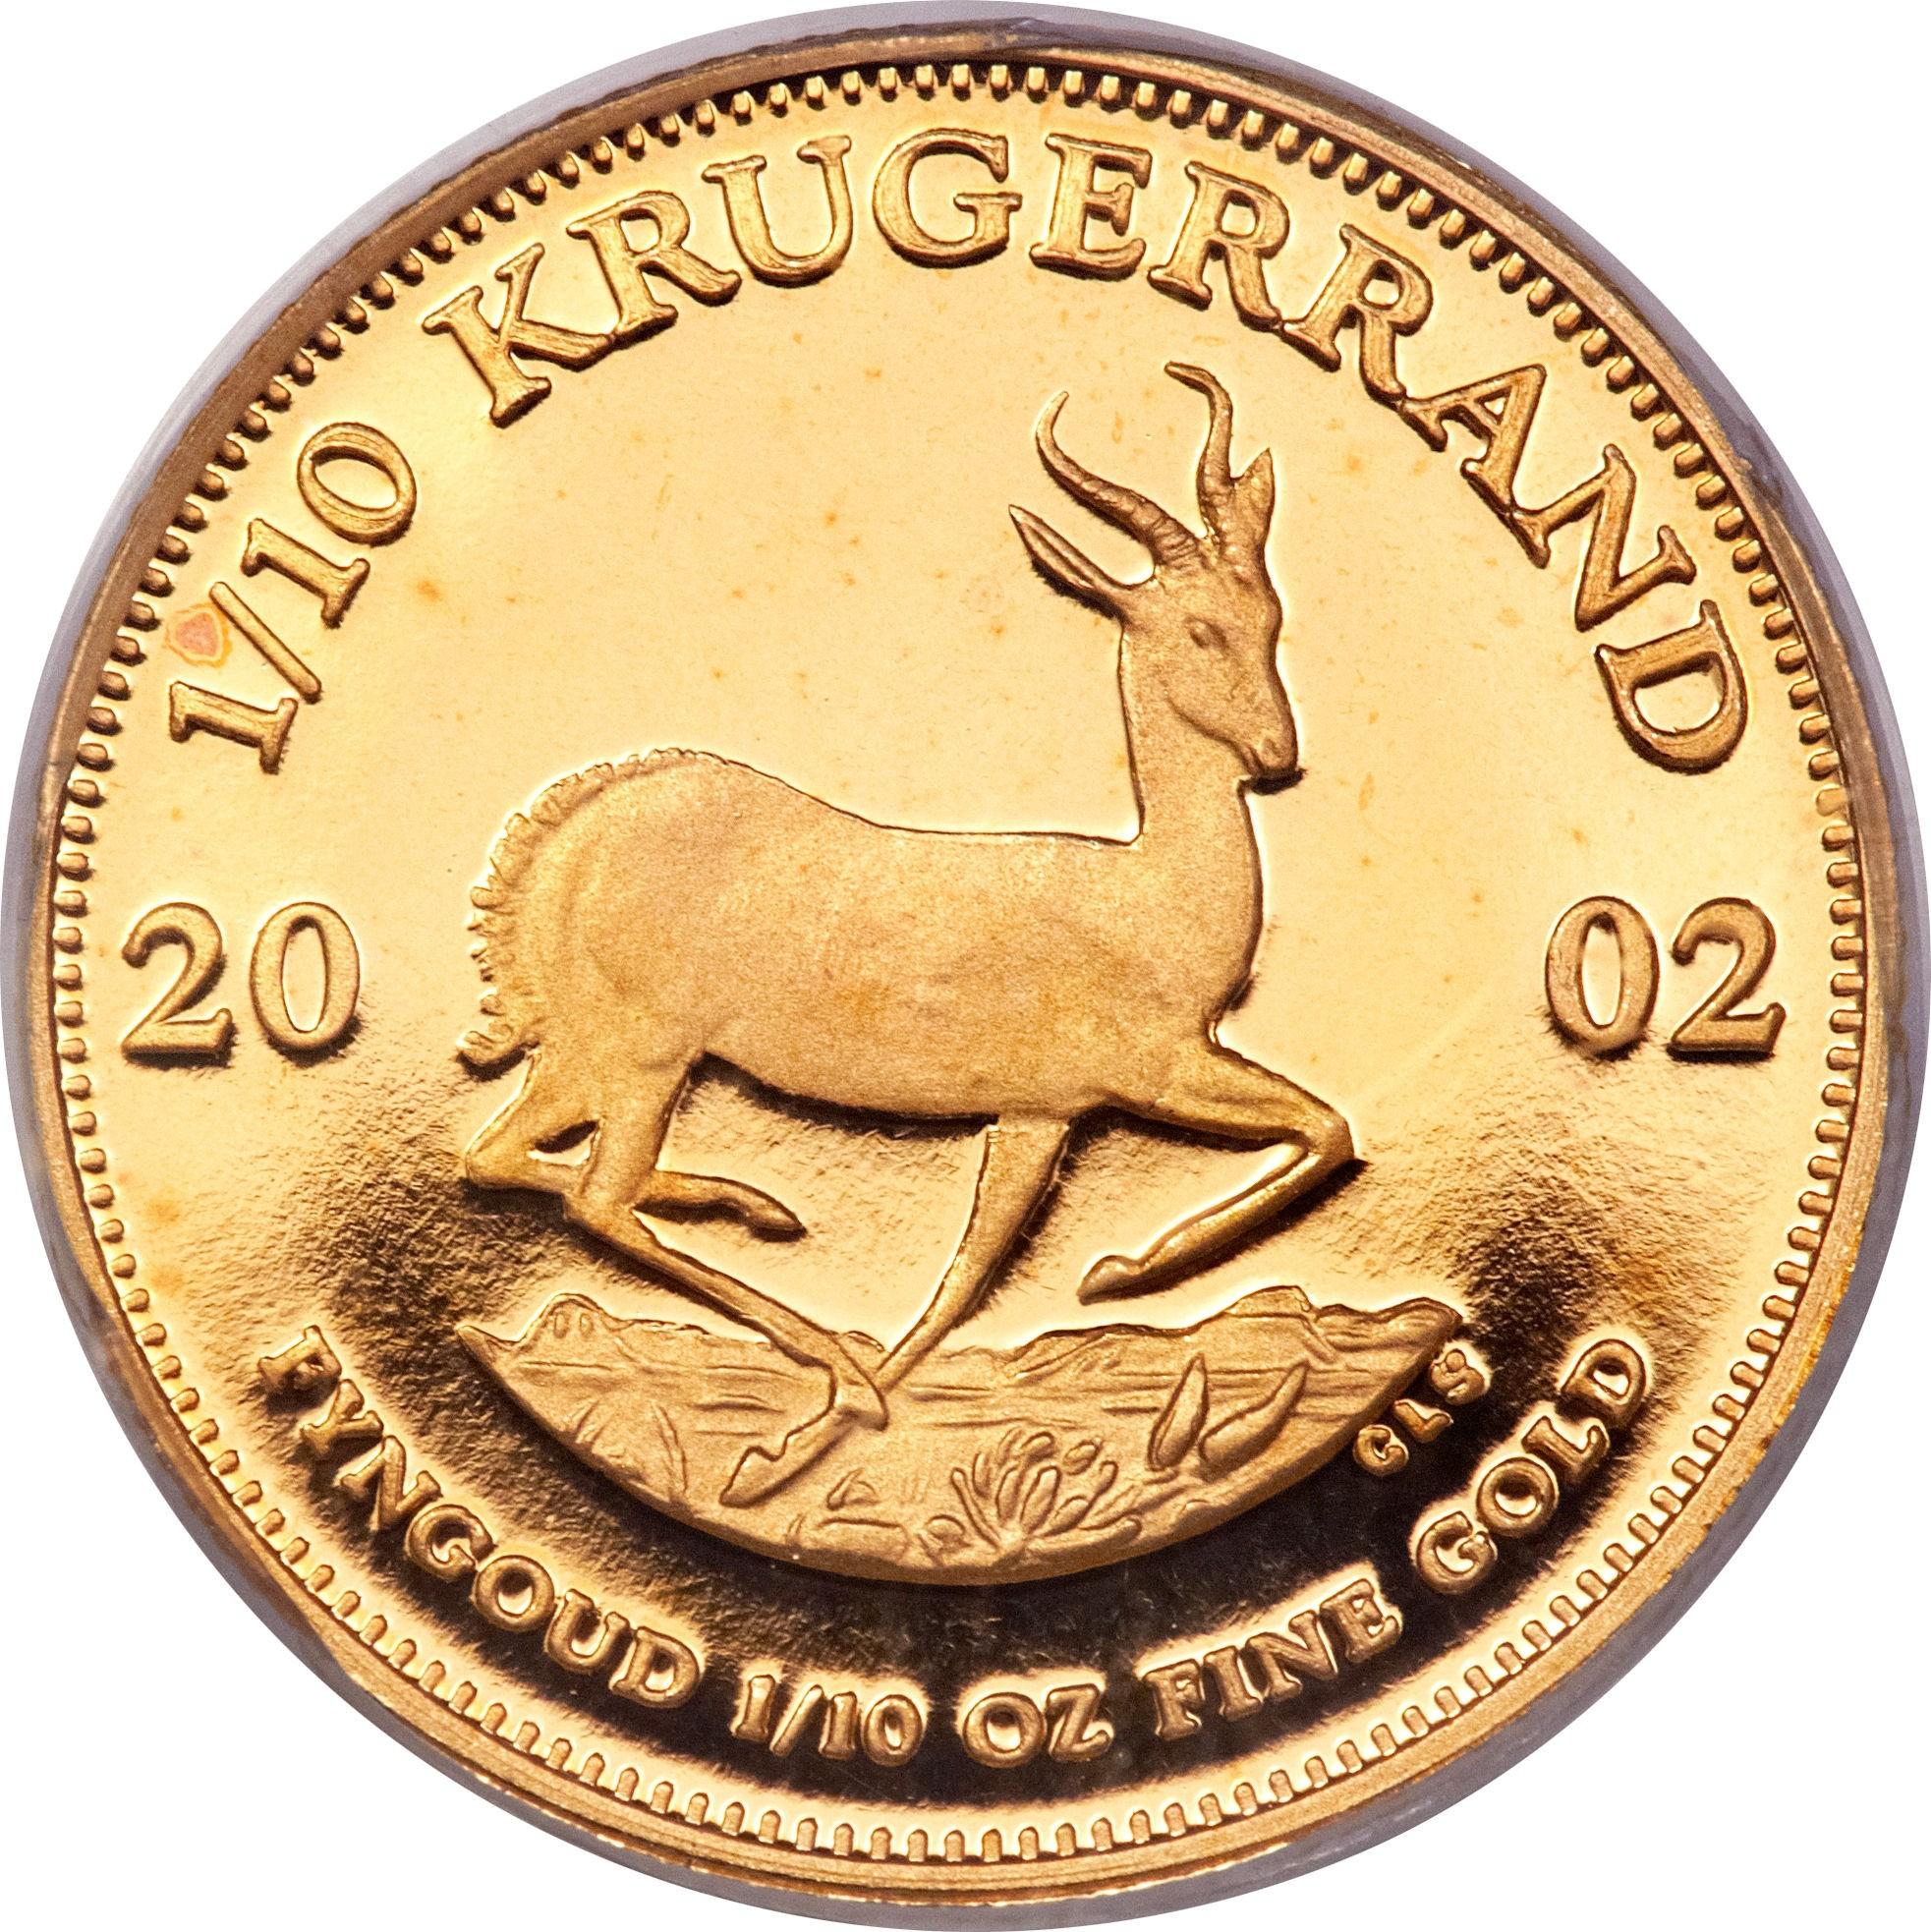 South Africa 1/10 Ounce Krugerrand (1980-2018)